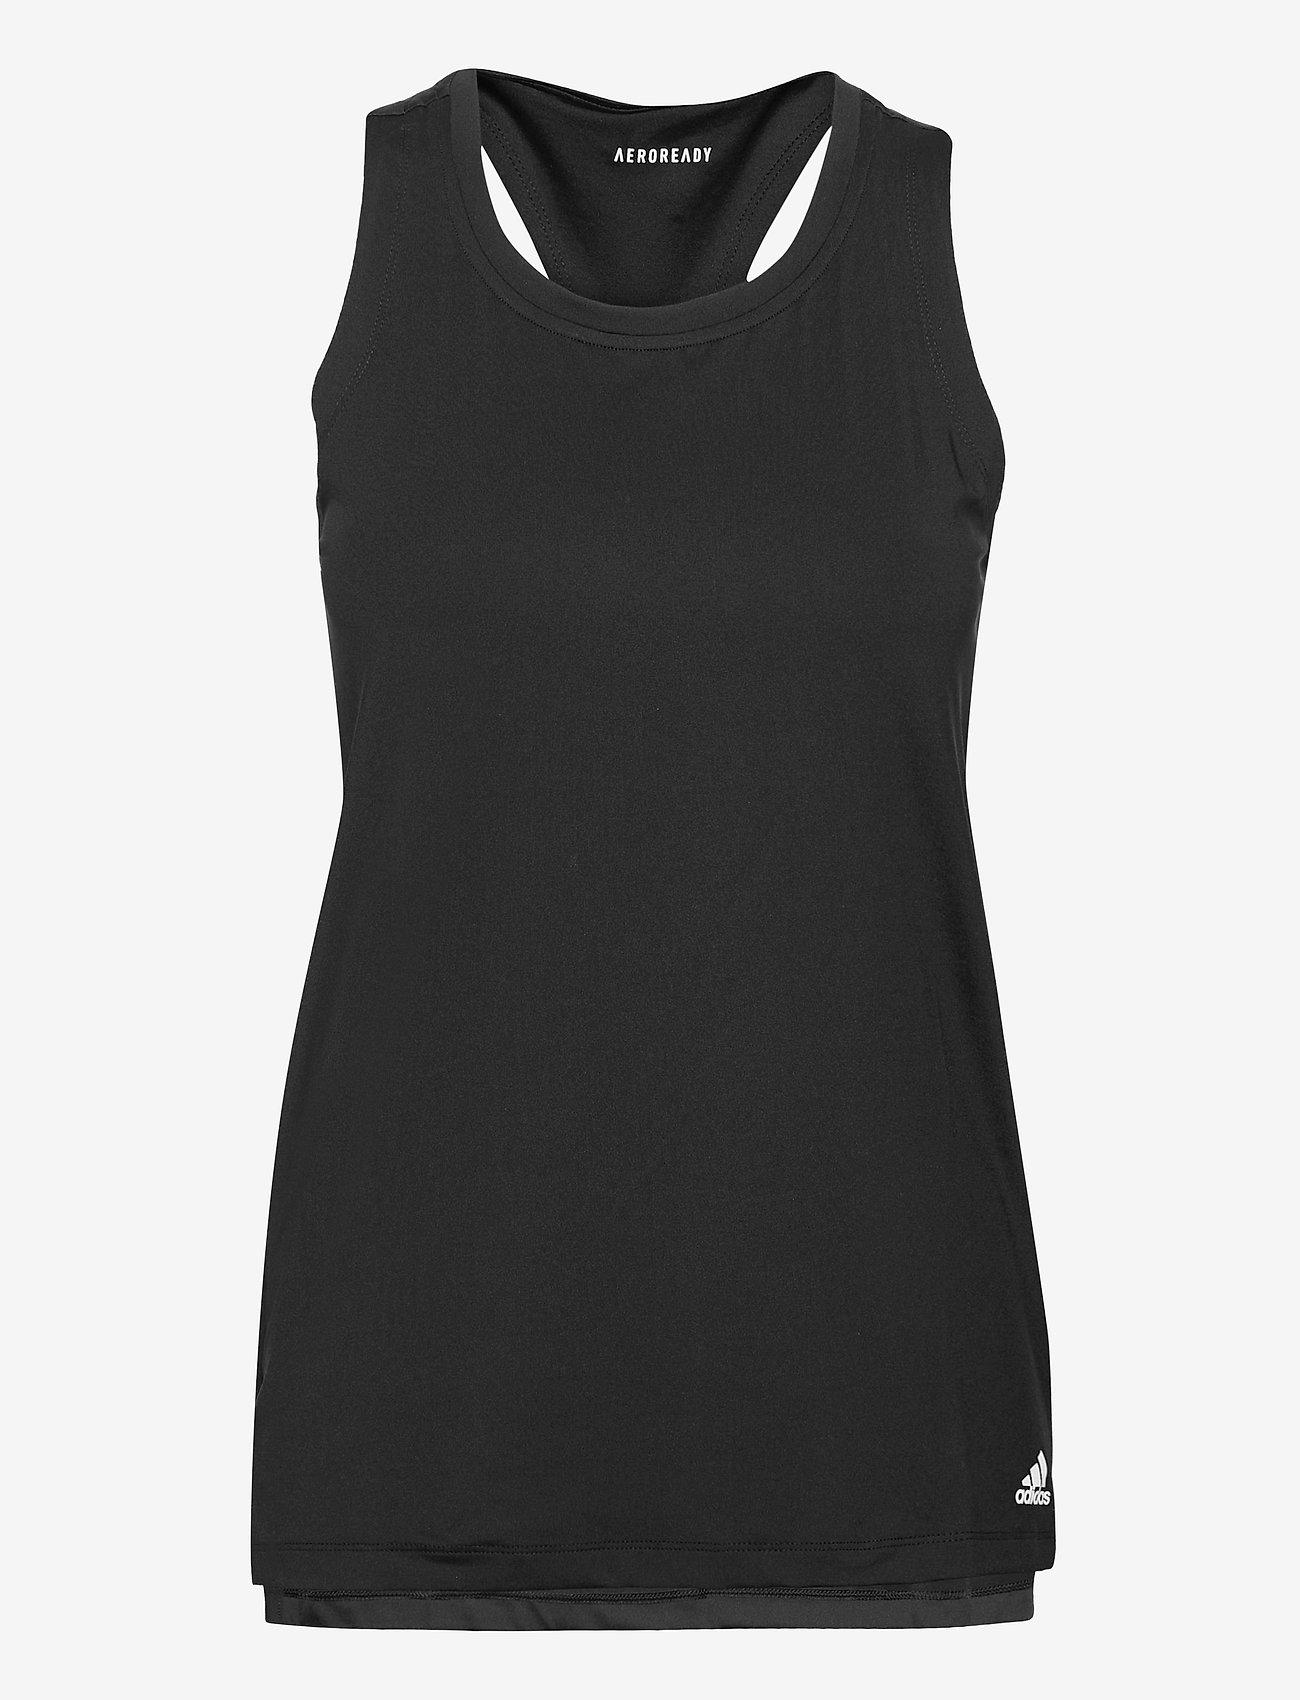 adidas Performance - Designed To Move AEROREADY Sport Tank Top W (Maternity) - topjes - black/white - 0